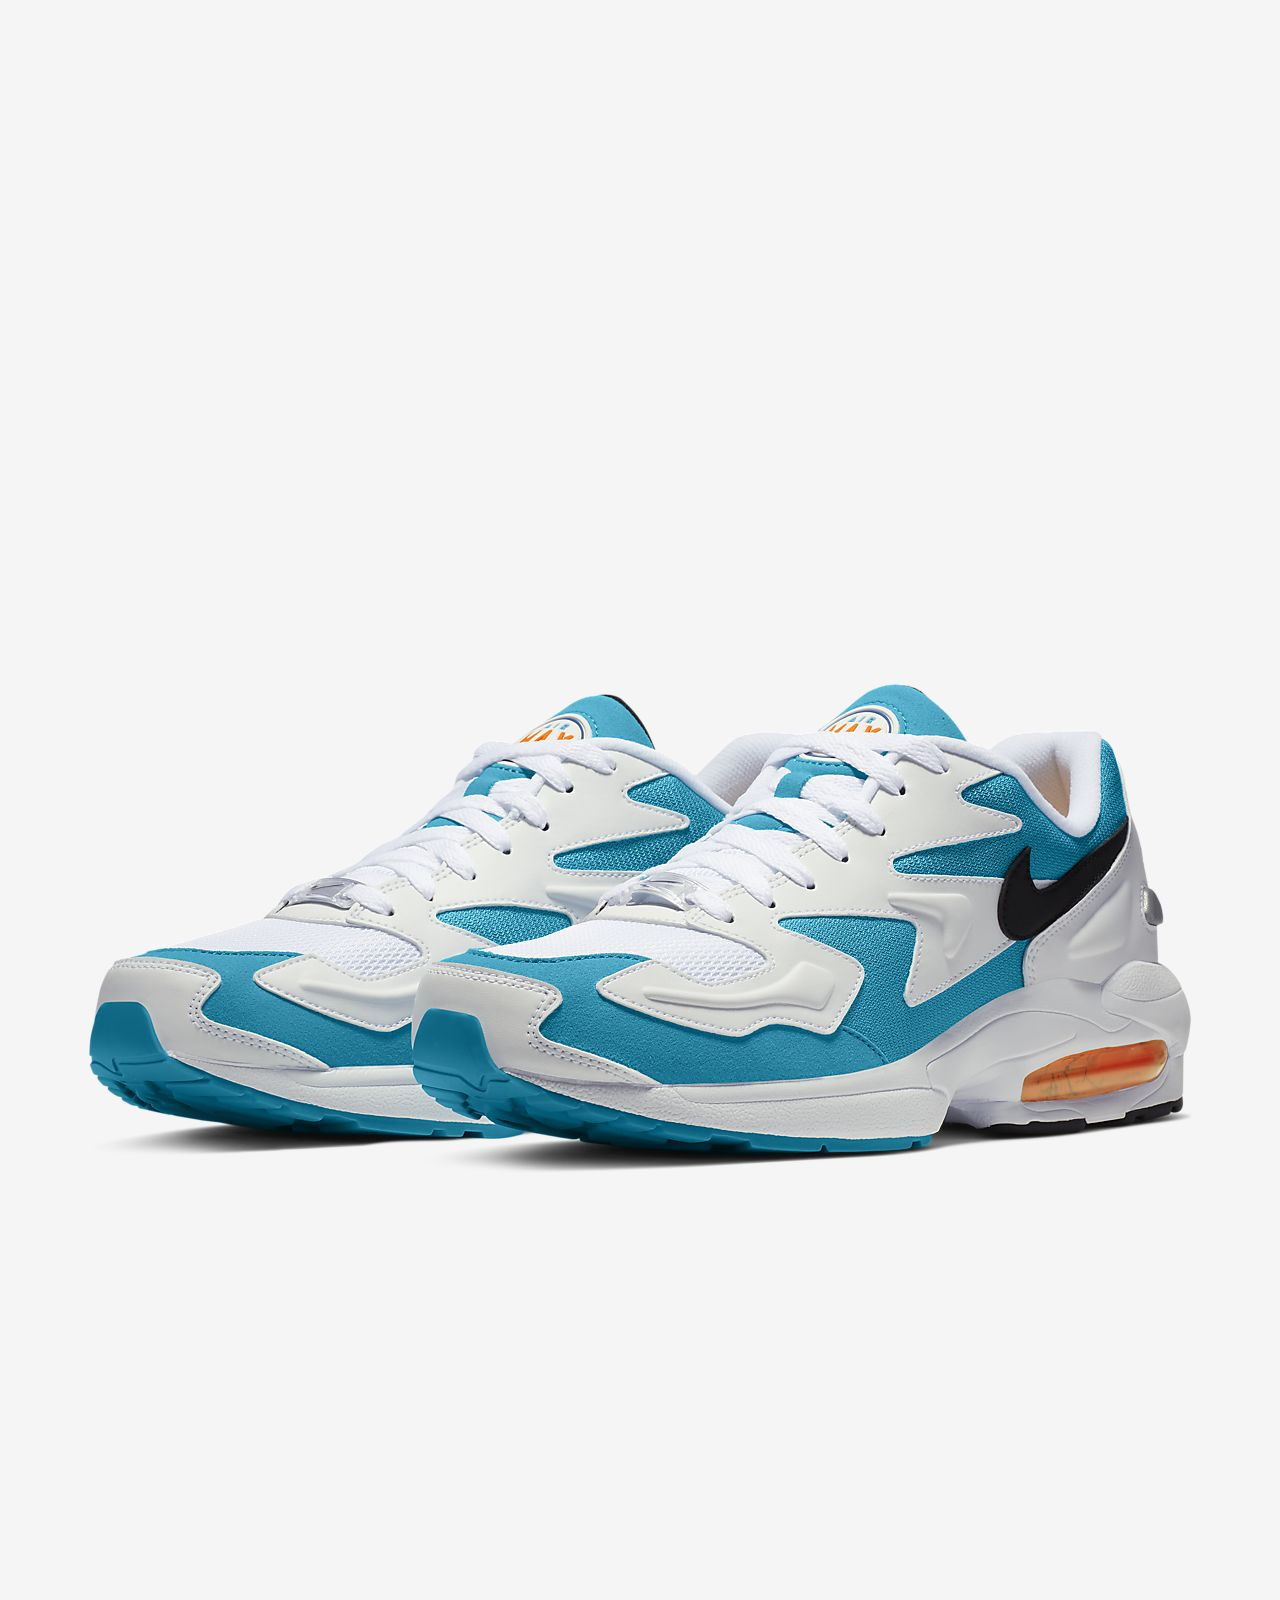 b22f3df0176 Nike Air Max2 Light Men s Shoe. Nike.com GB